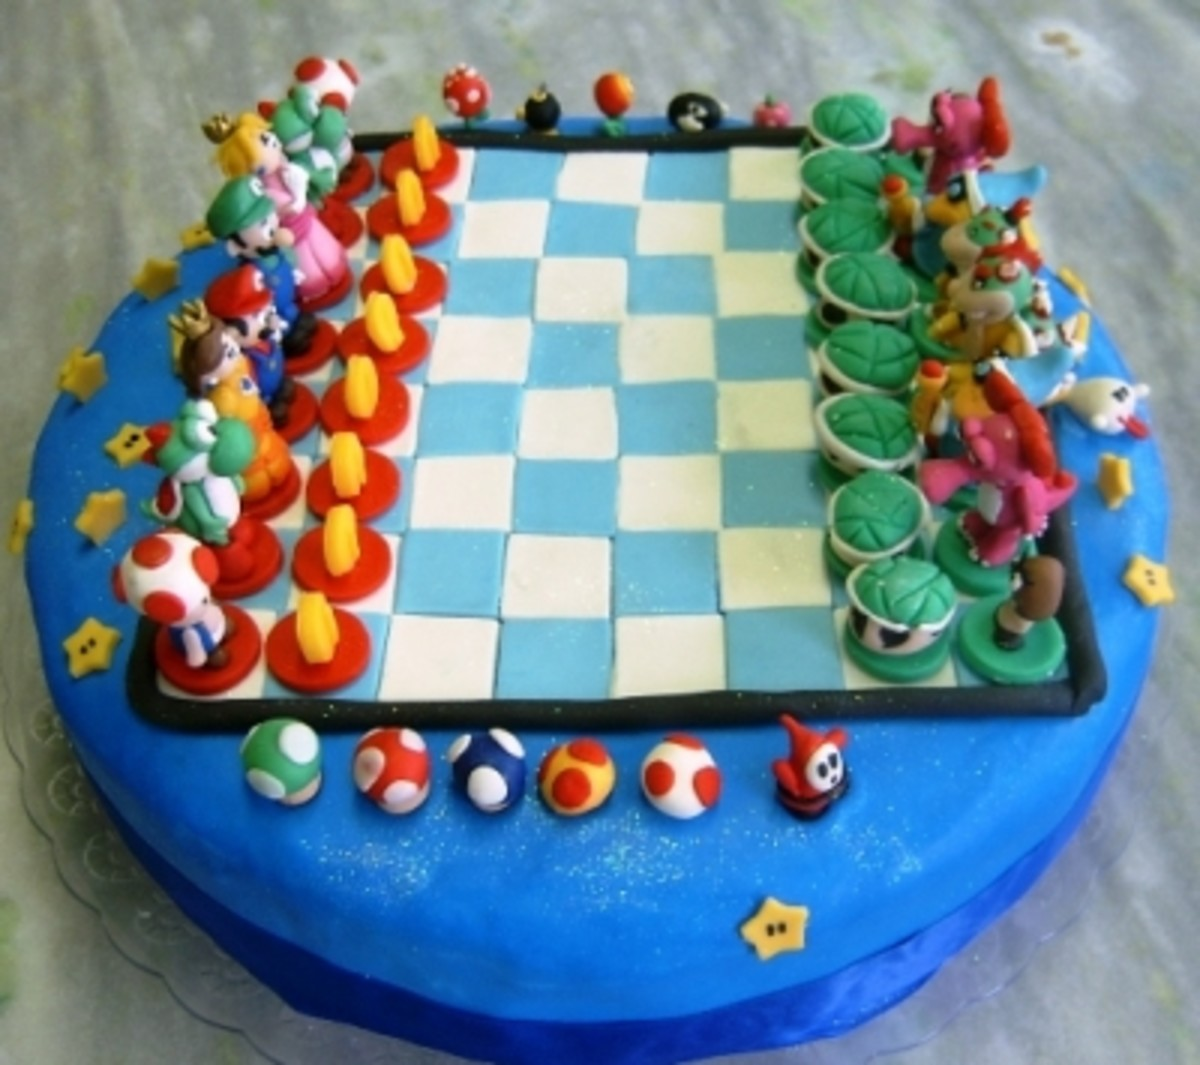 Incredible Mario Chess Cake by Ana Fuji